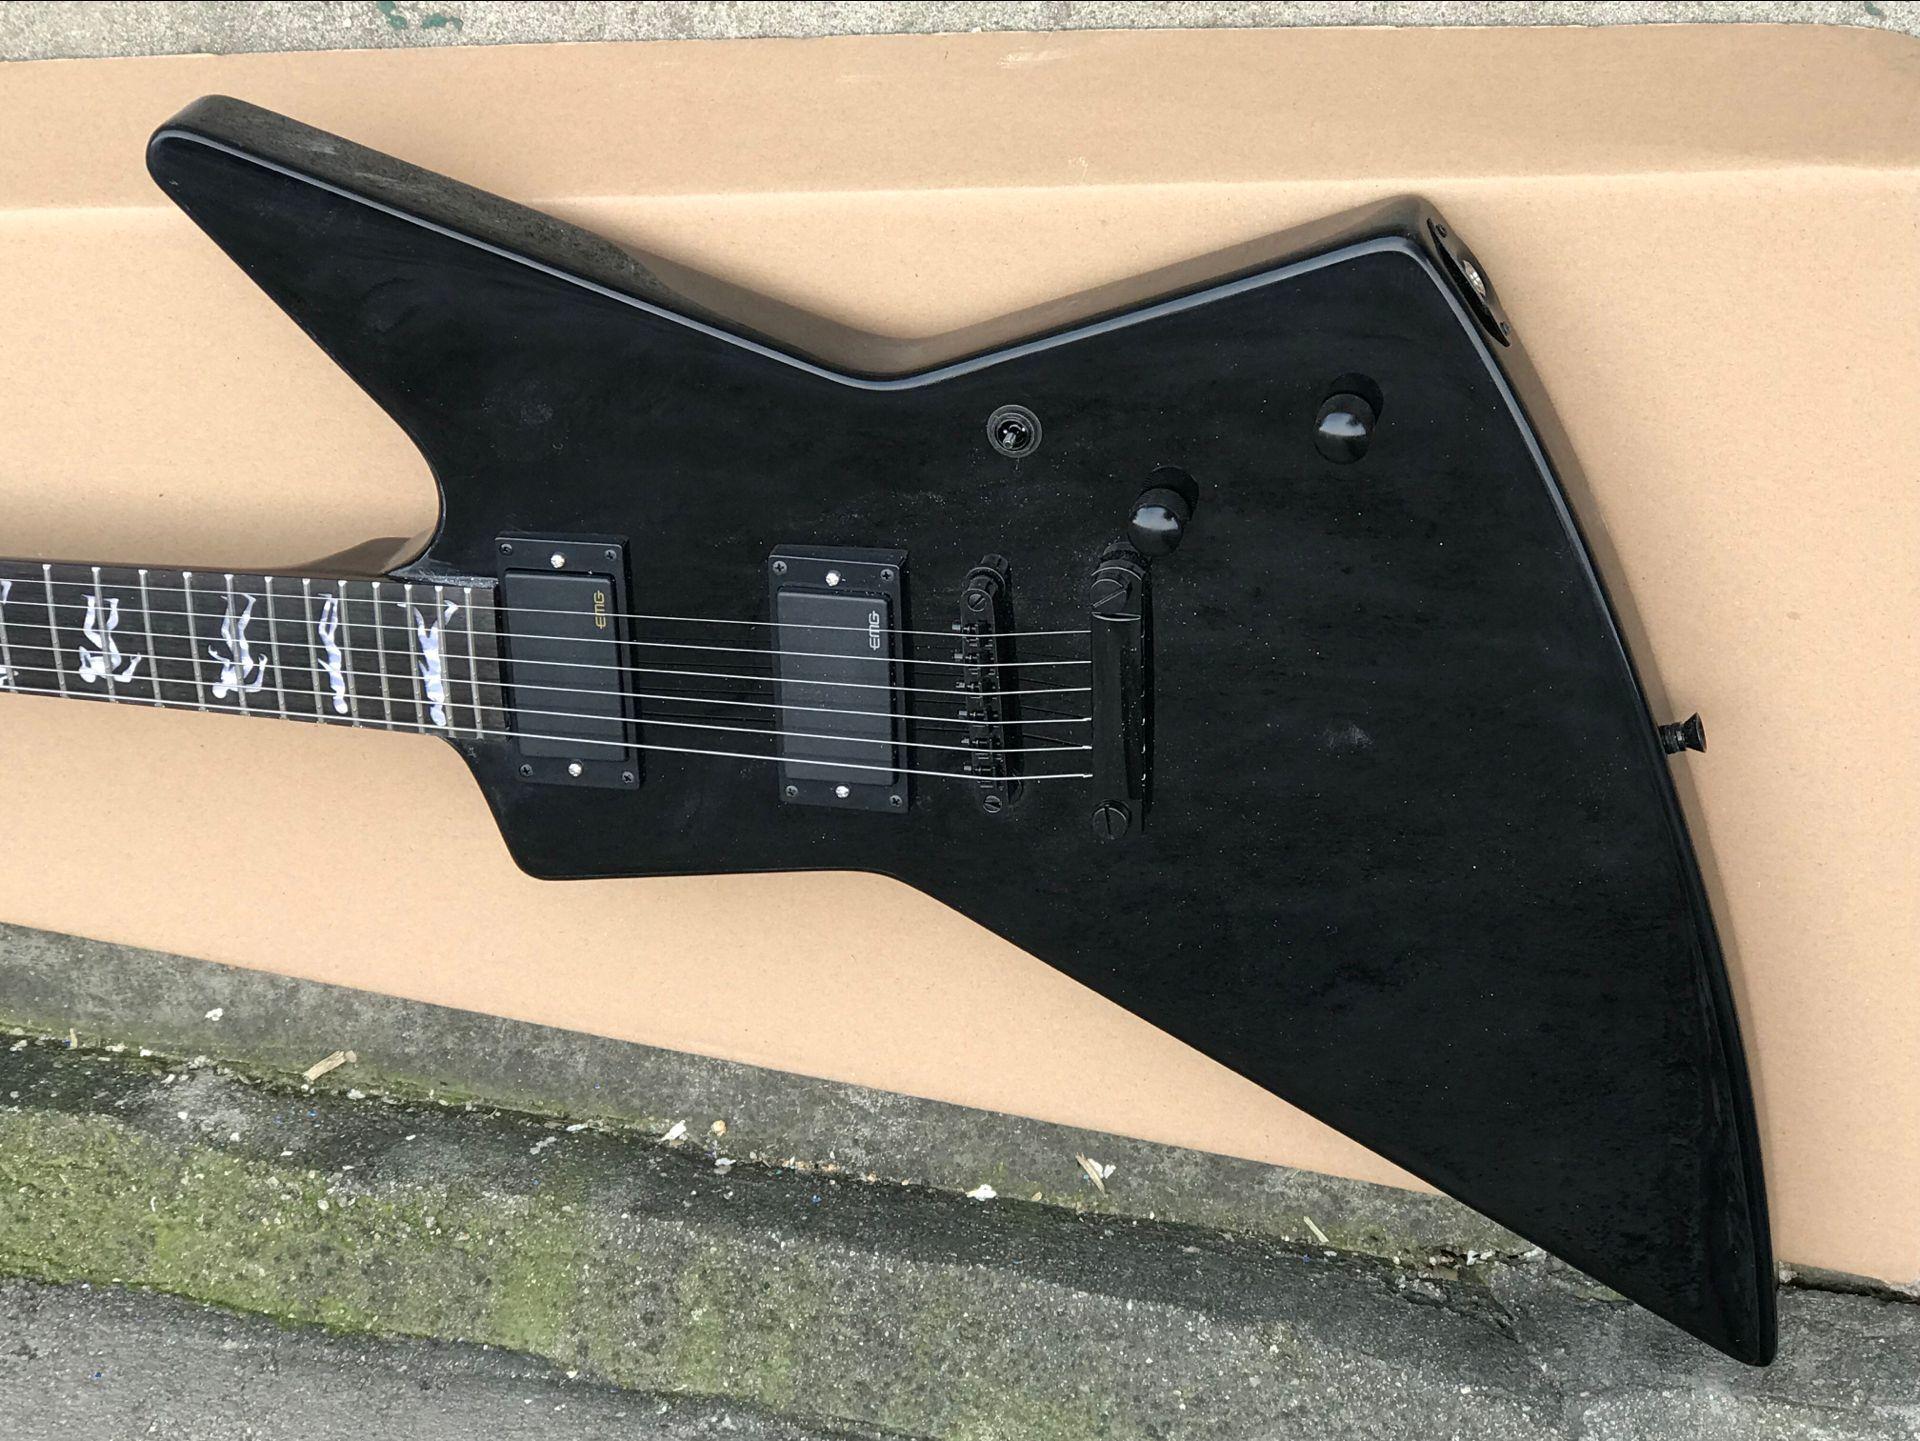 Metallo pesante Ironico James Hetfield Gloss Black Explorer Guitar Electric Guitar Man To Wolf Inlay, EMG Active Pickup 9v Battery Box, hardware nero